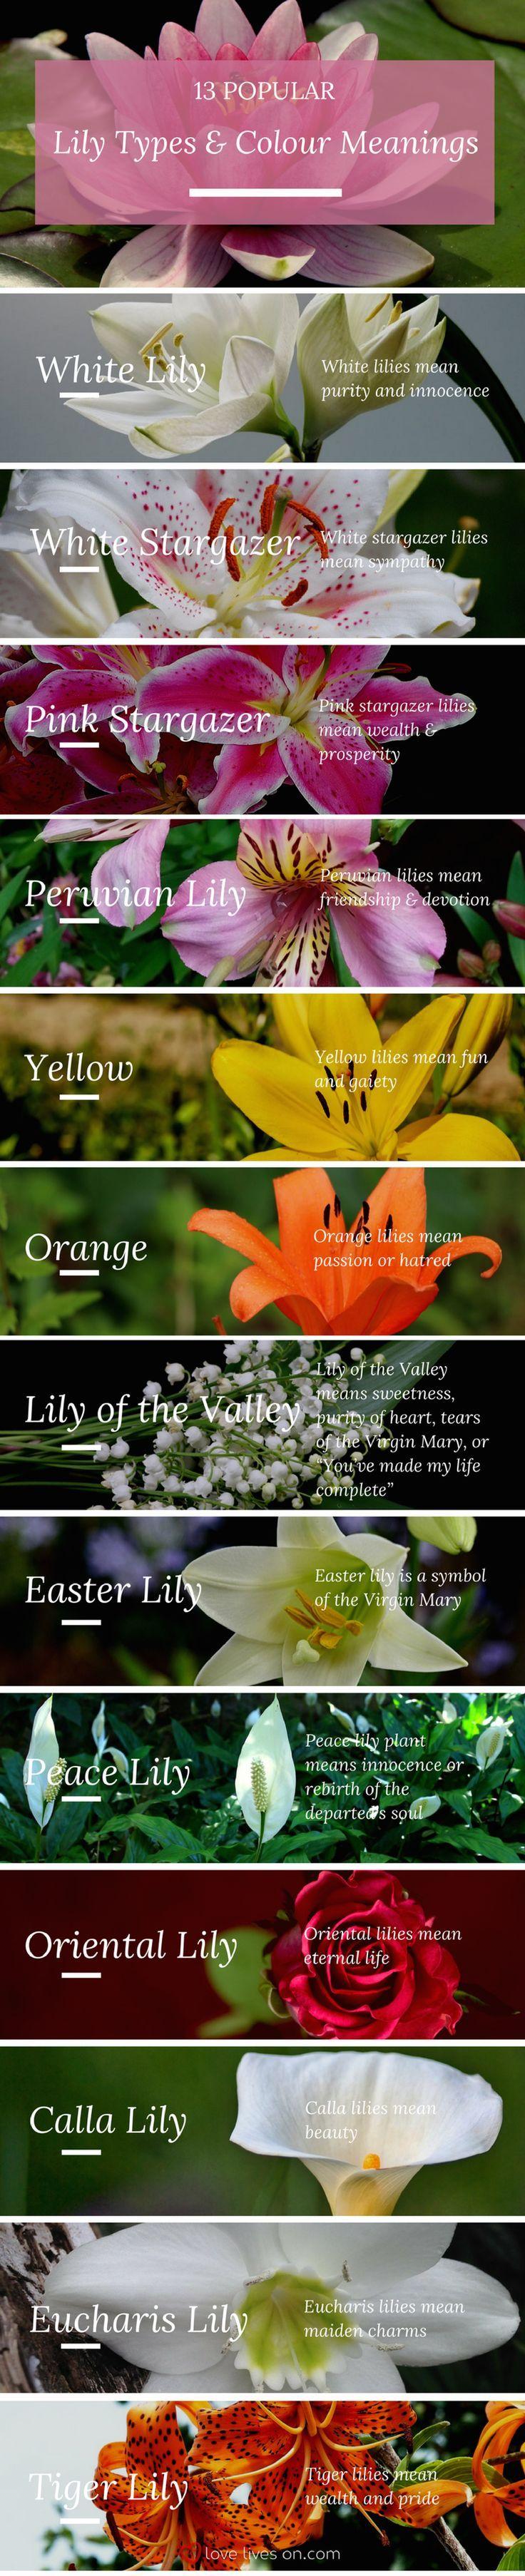 78 best 10 best funeral flowers their meanings images on 10 best funeral flowers dhlflorist Image collections